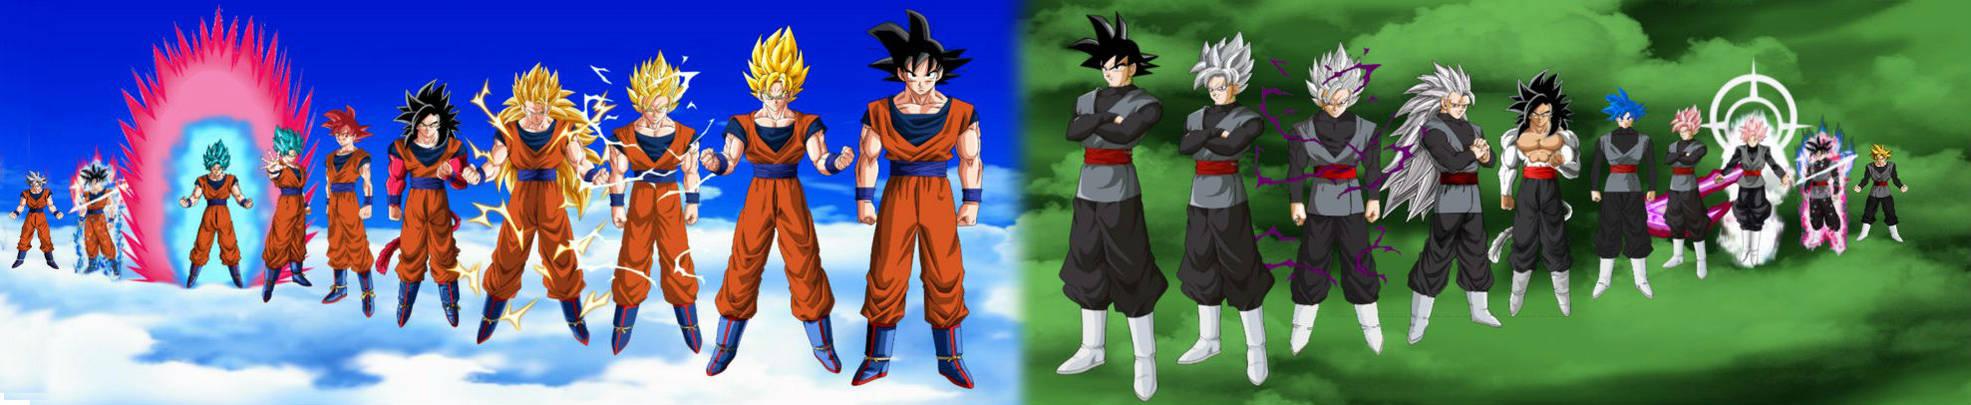 Dragon Ball Super - Goku and Black Transformations